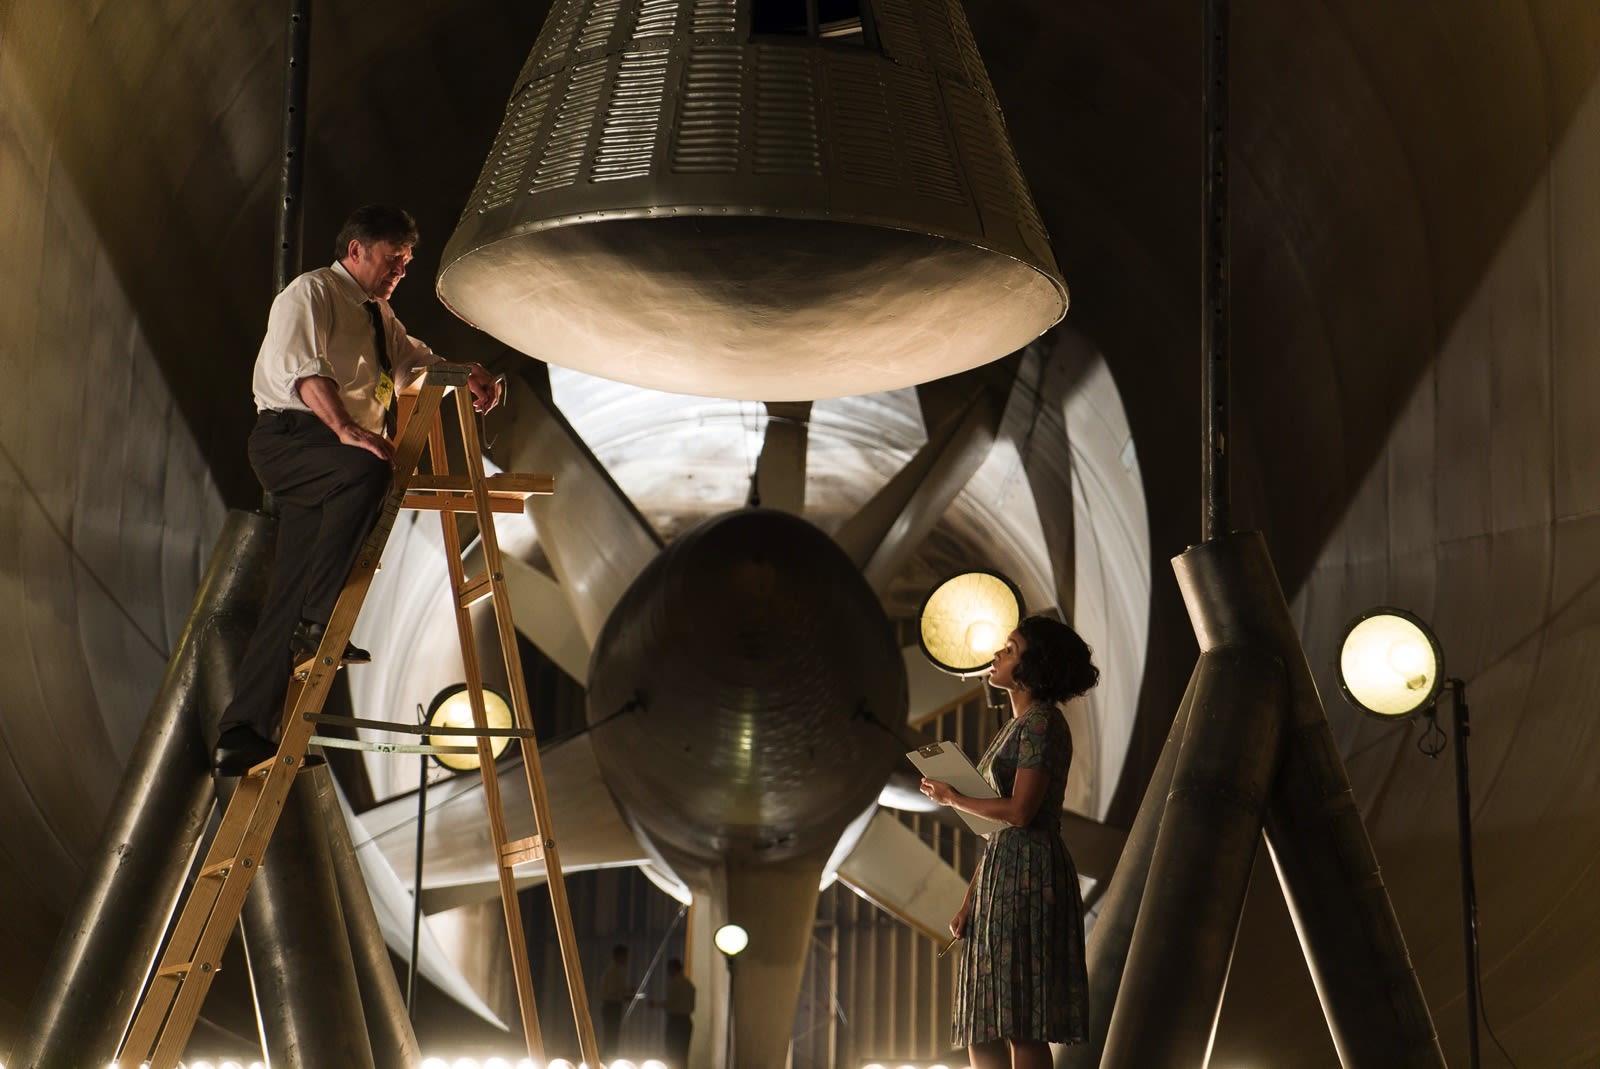 DF-00227_R - Mary Jackson (Janelle Monae) offers some help to NASA mission specialist Karl Zielinski (Olek Krupa). Photo Credit: Hopper Stone.